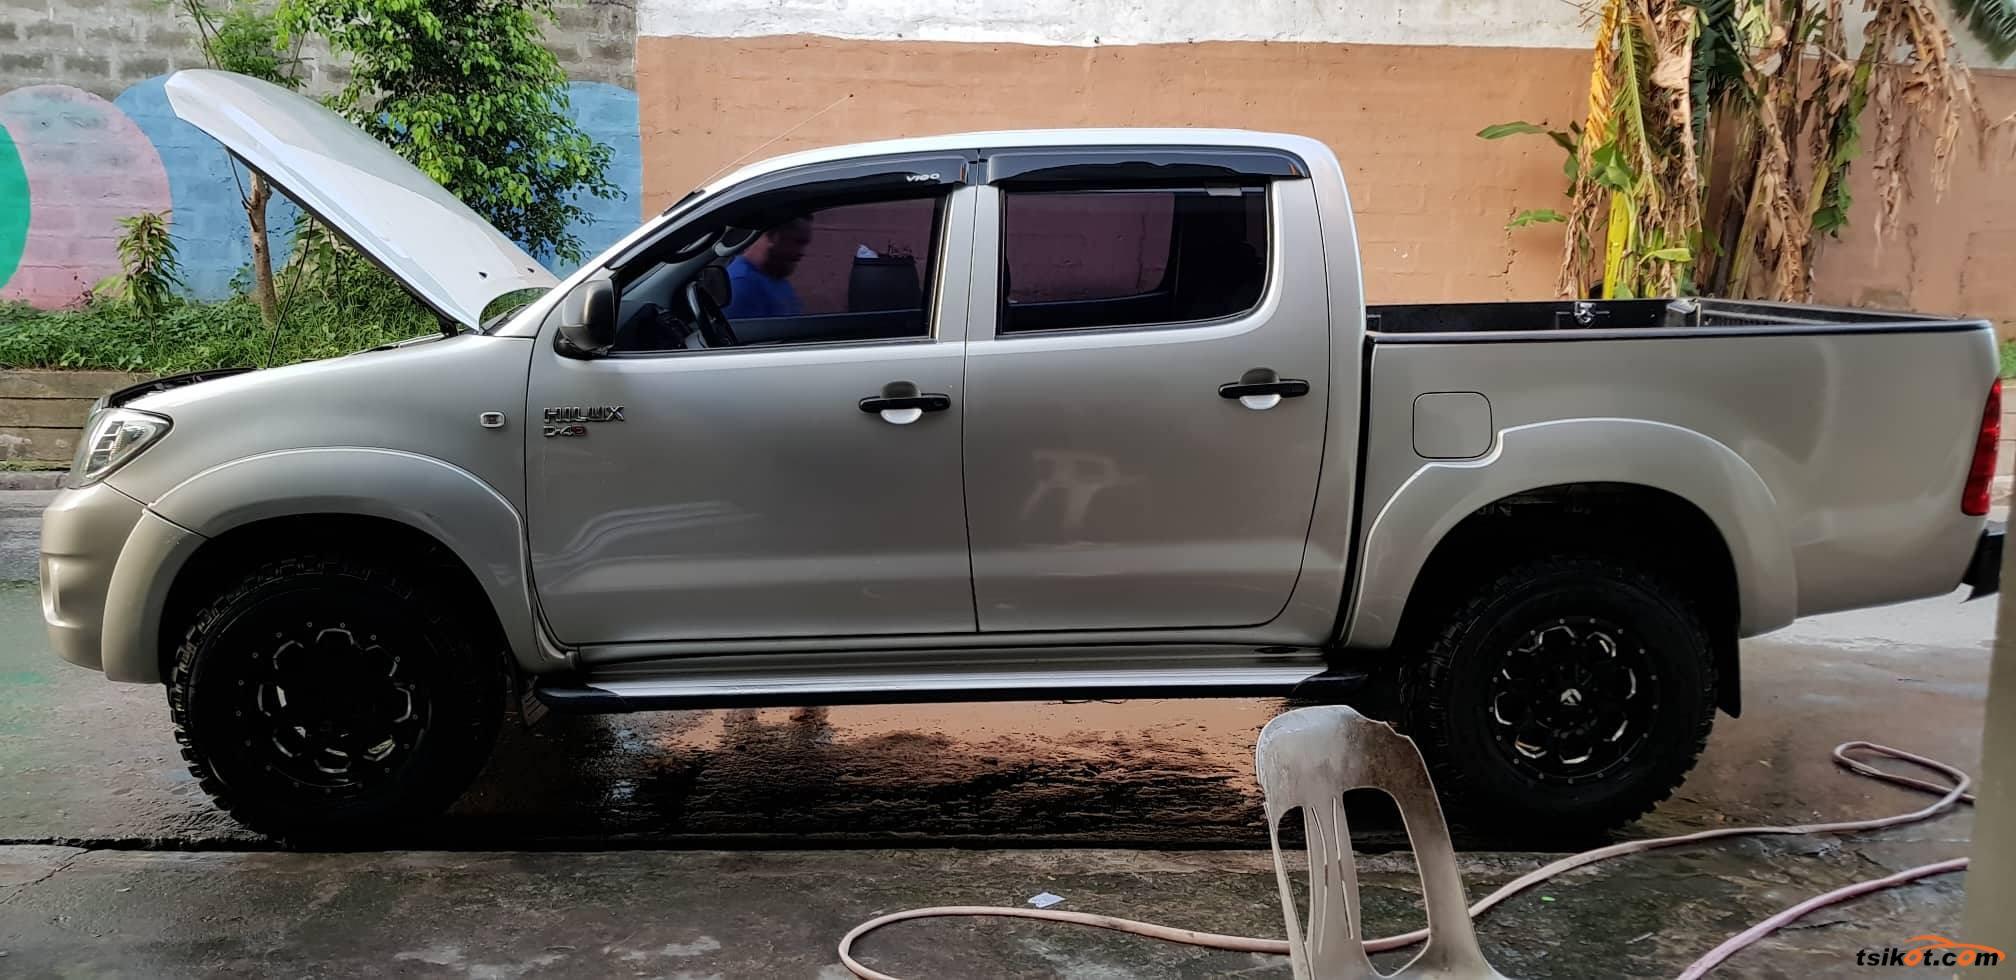 Toyota Hilux 2011 - 8